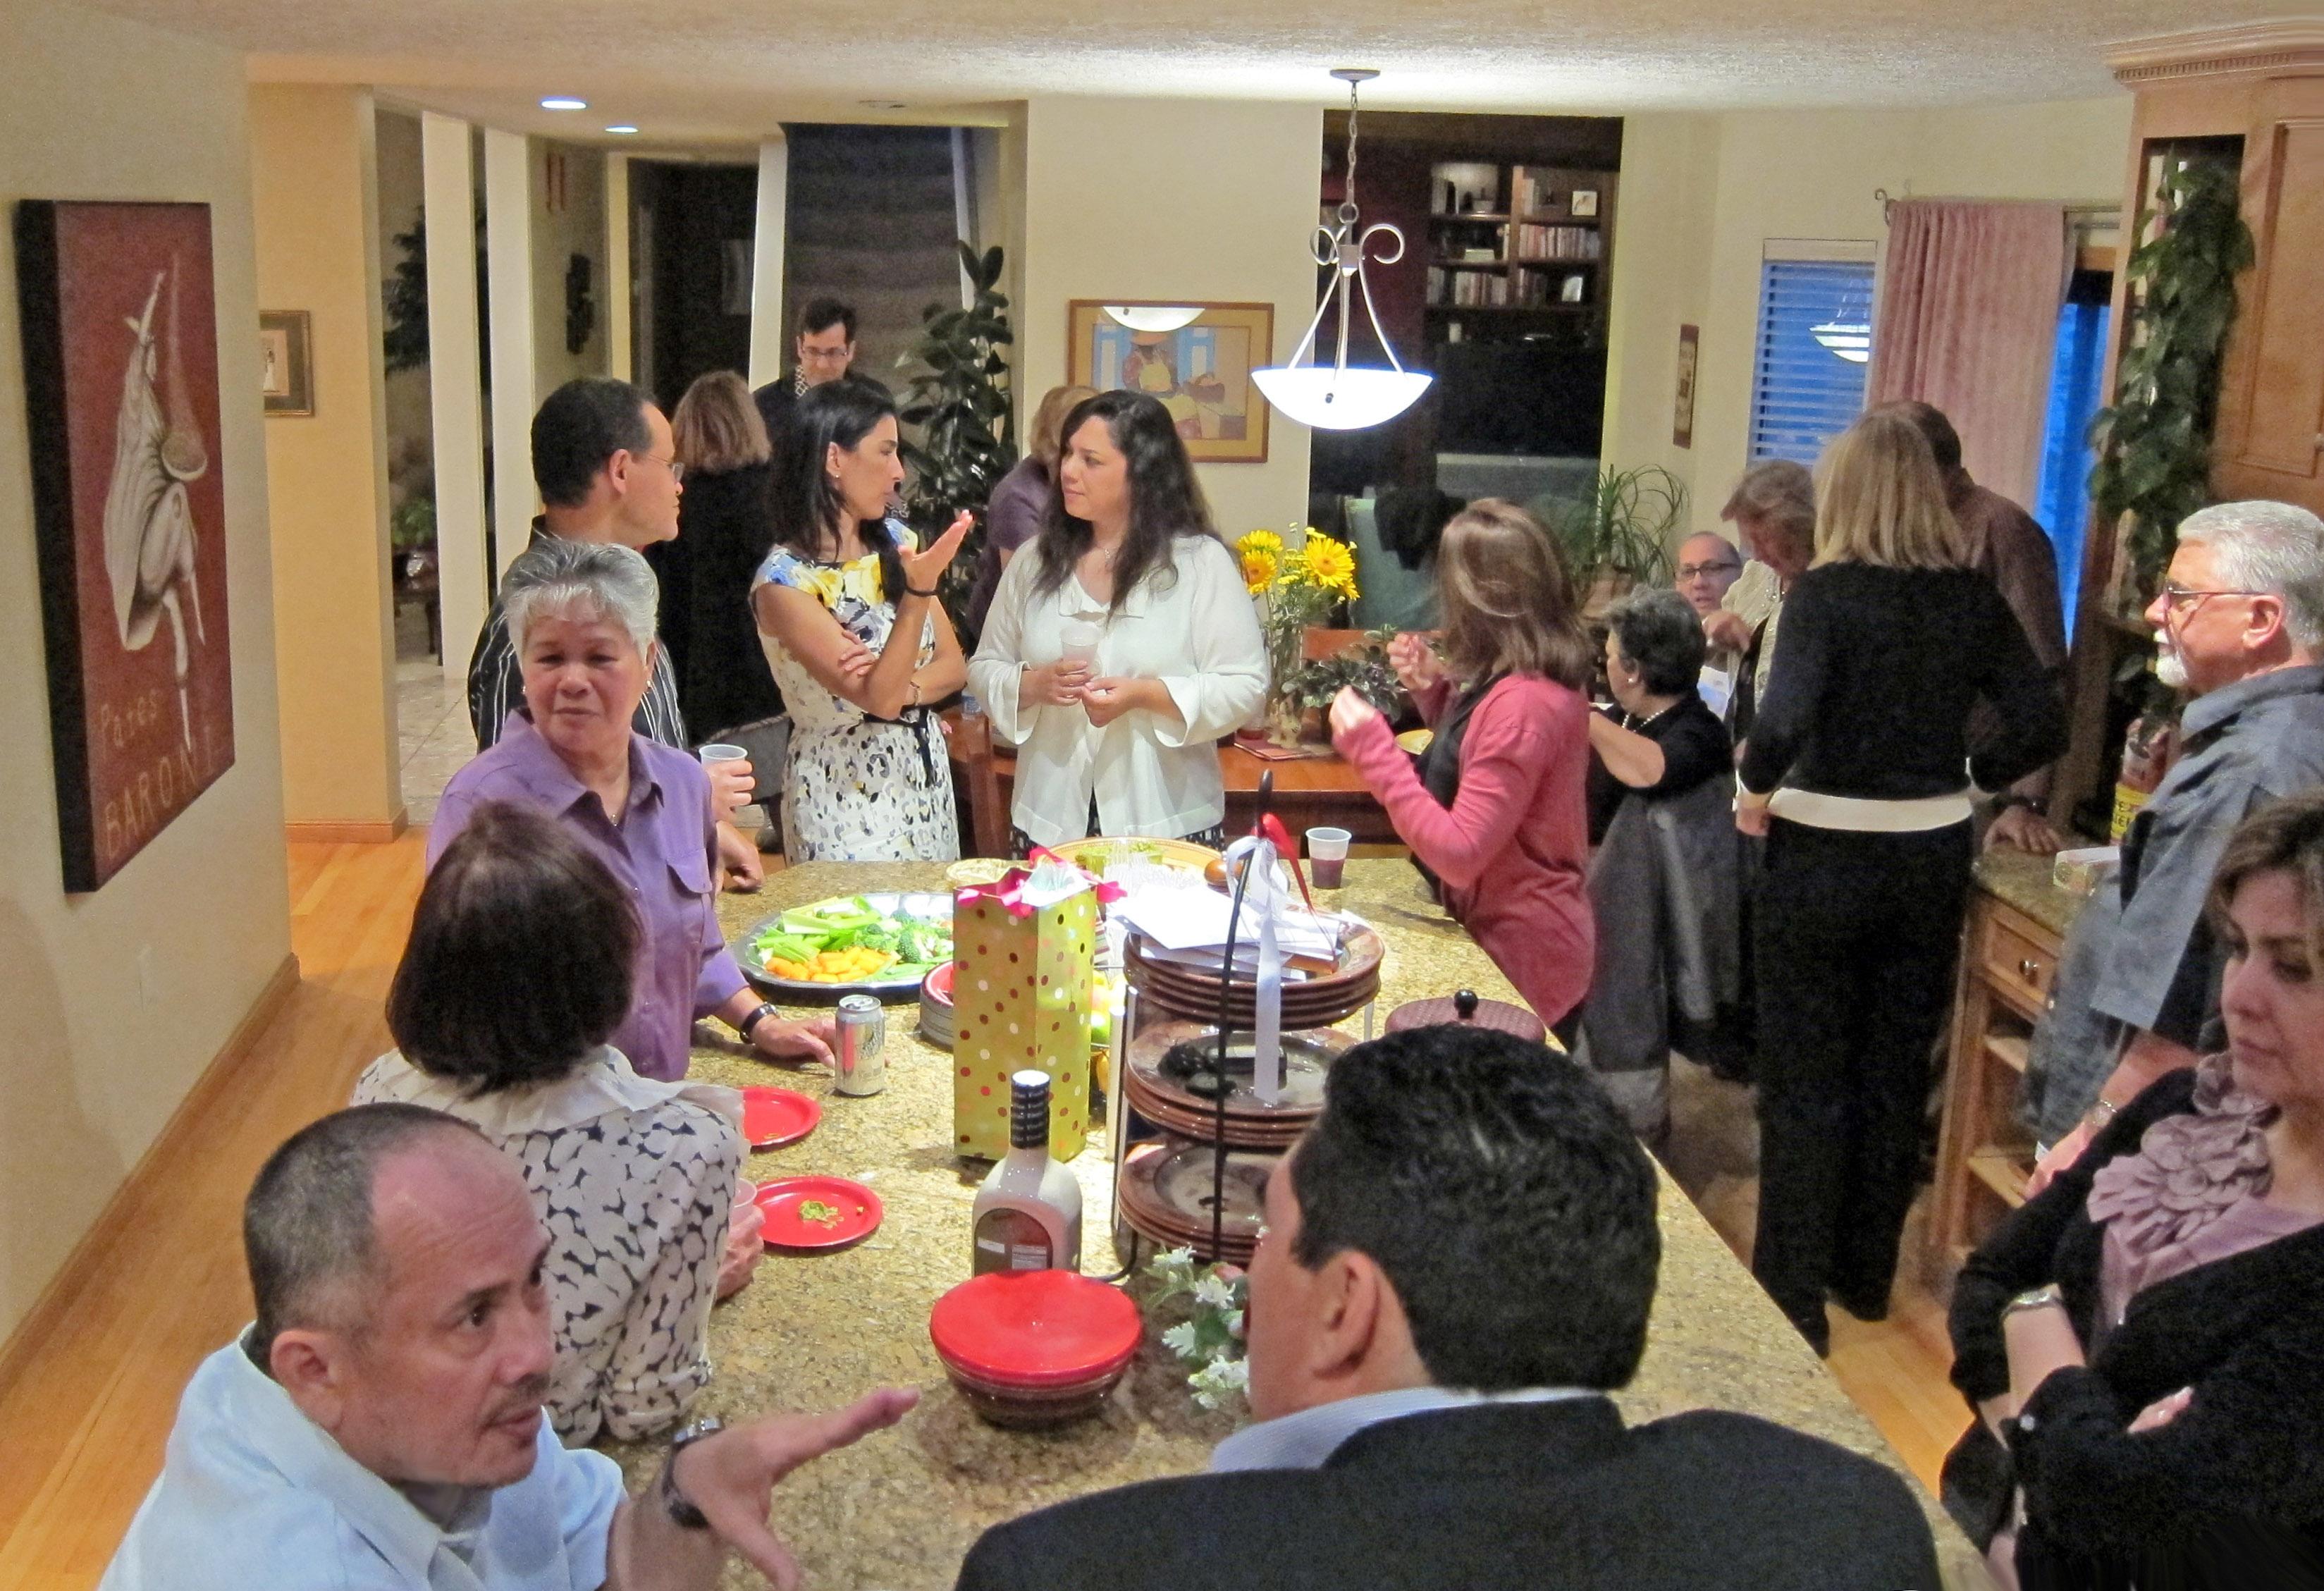 Kitchen Party Kitchen Party Rapnacionalinfo